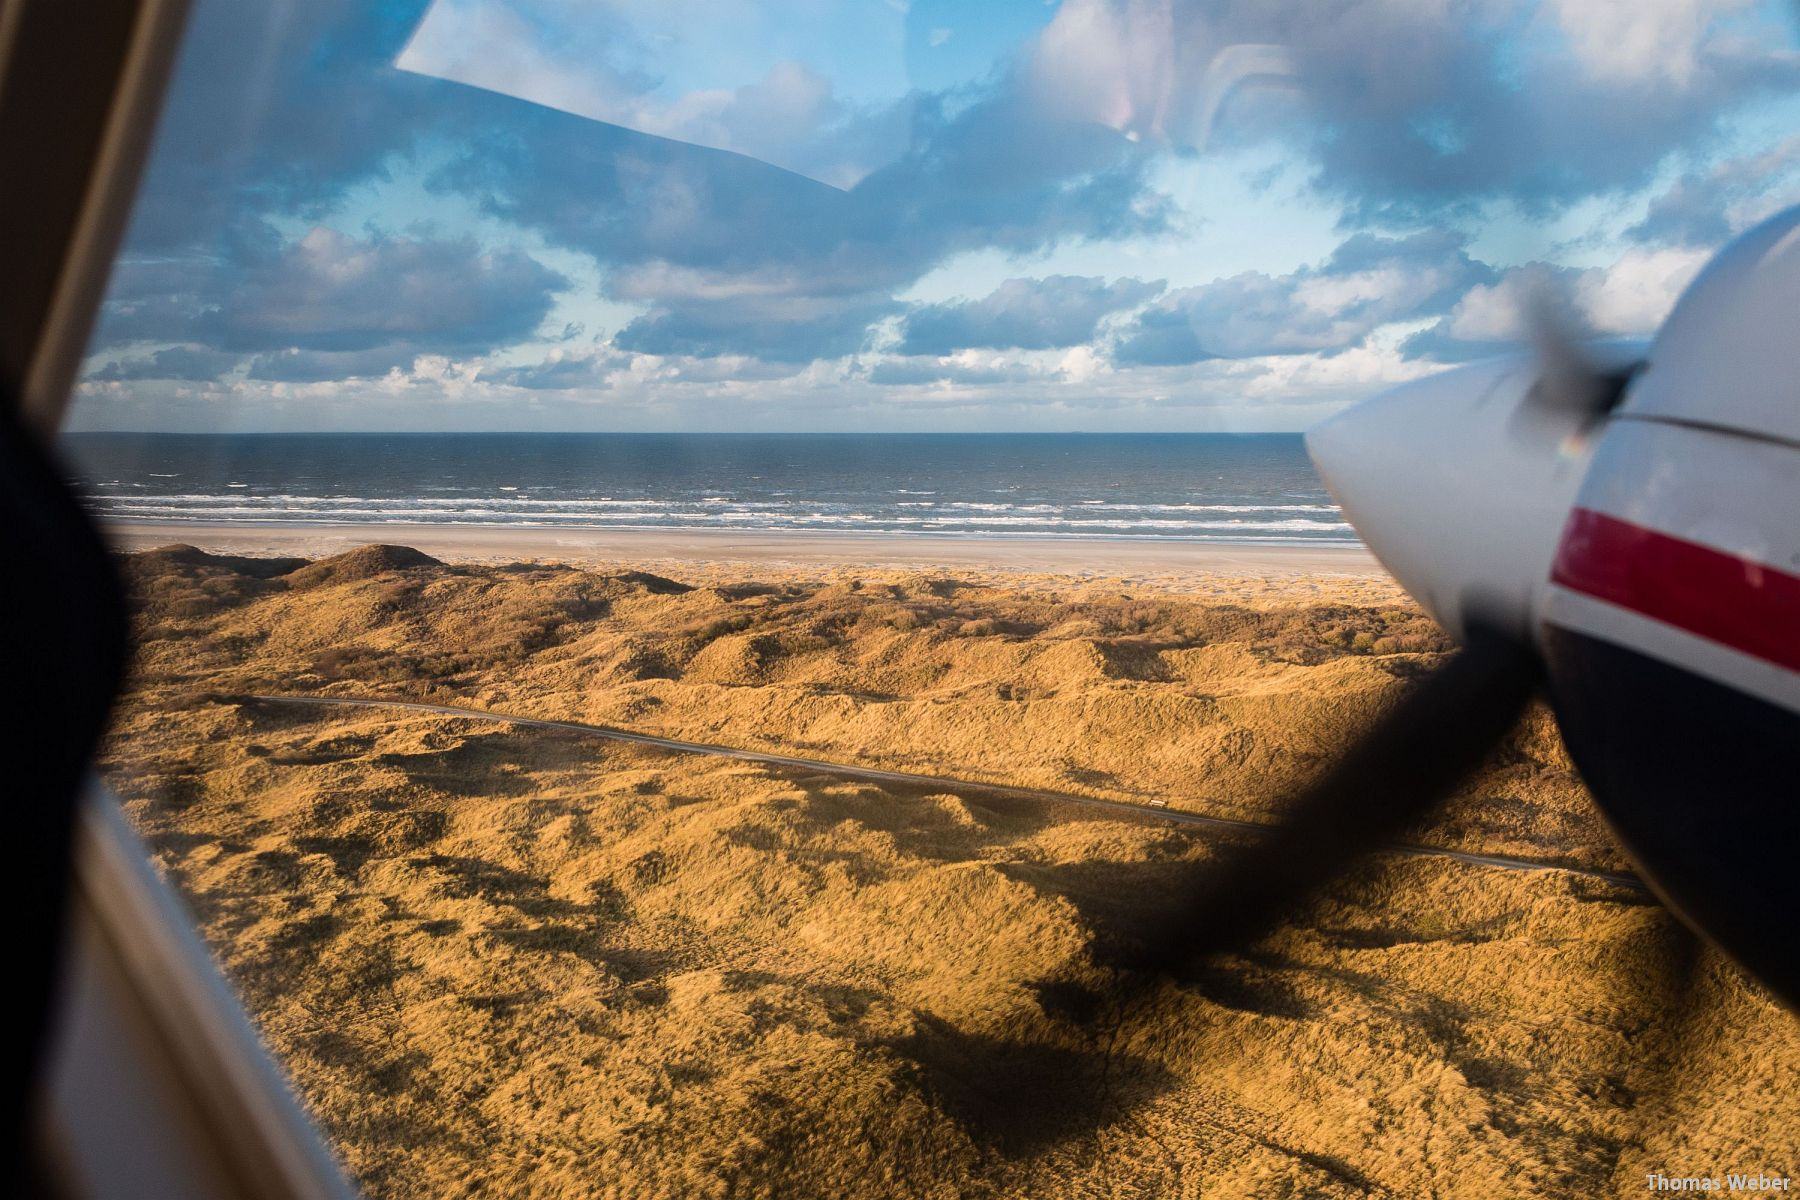 Fotograf Thomas Weber aus Oldenburg: Flucht vor dem Orkan Xaver mit dem Inselflieger Juist (6)